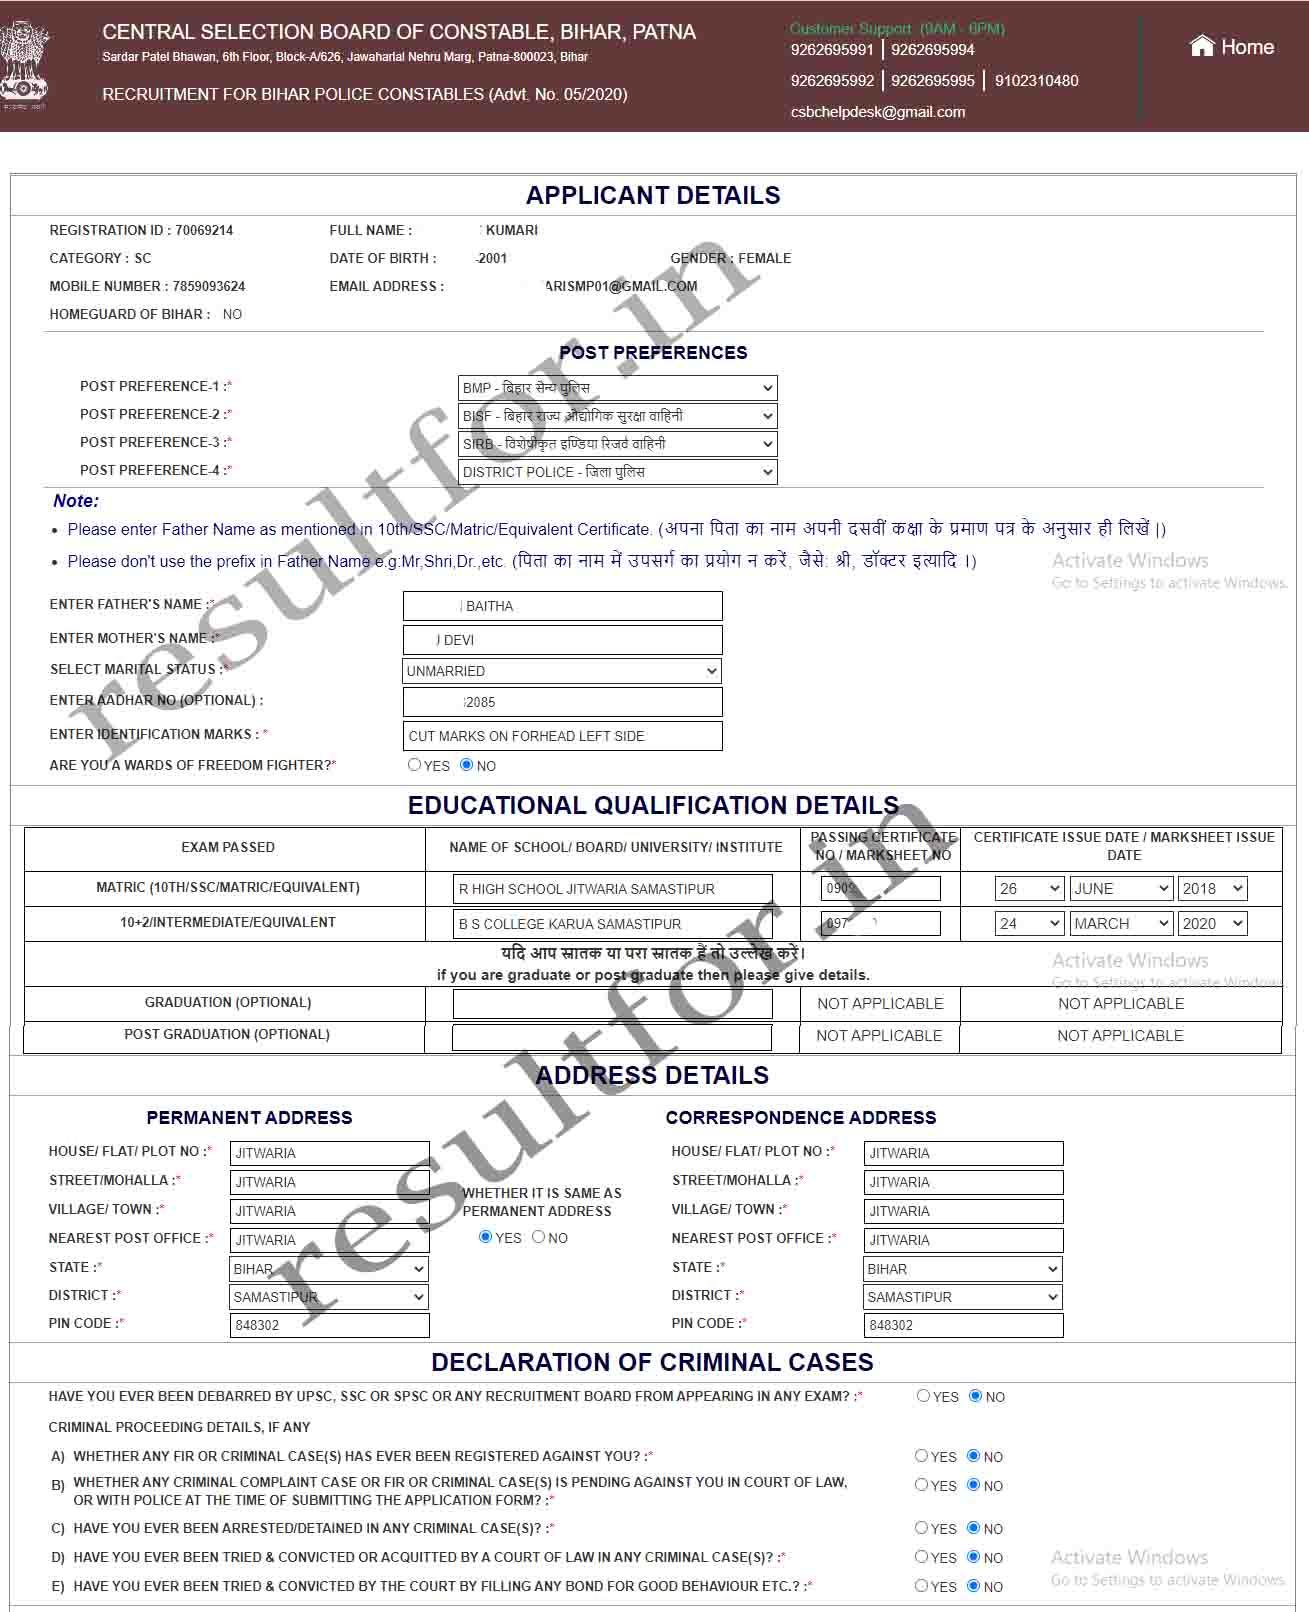 Bihar-Police-Constable-form-details-filling